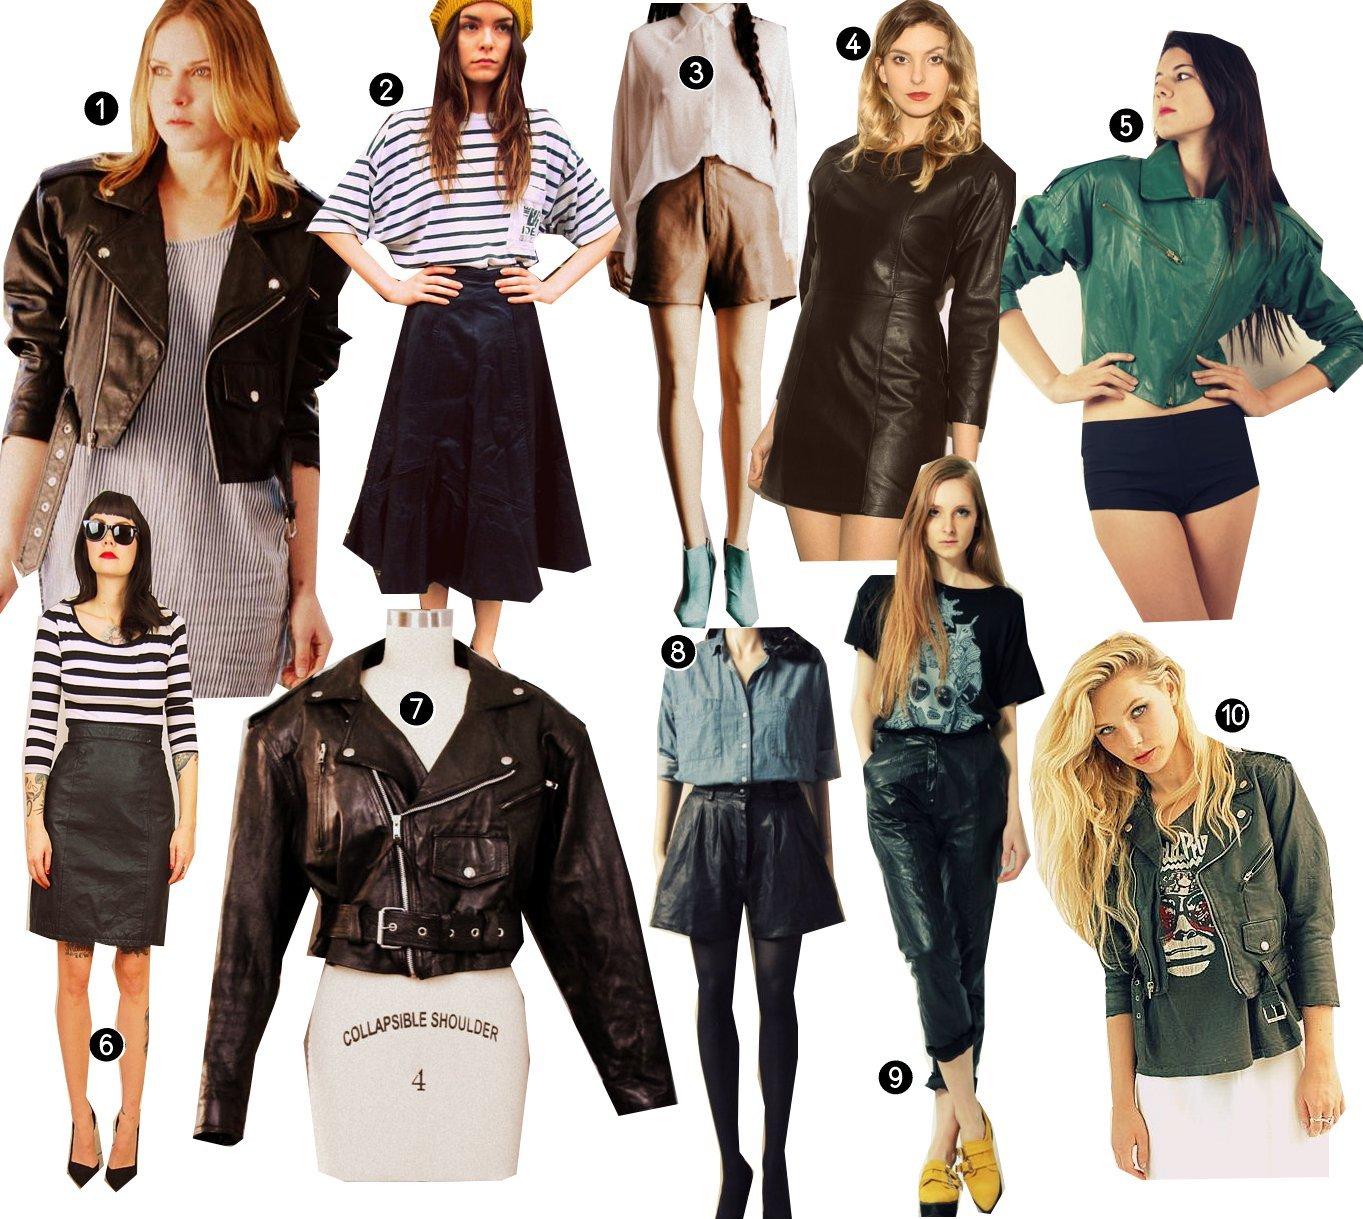 Black Leather Shirt Hot Girls Wallpaper